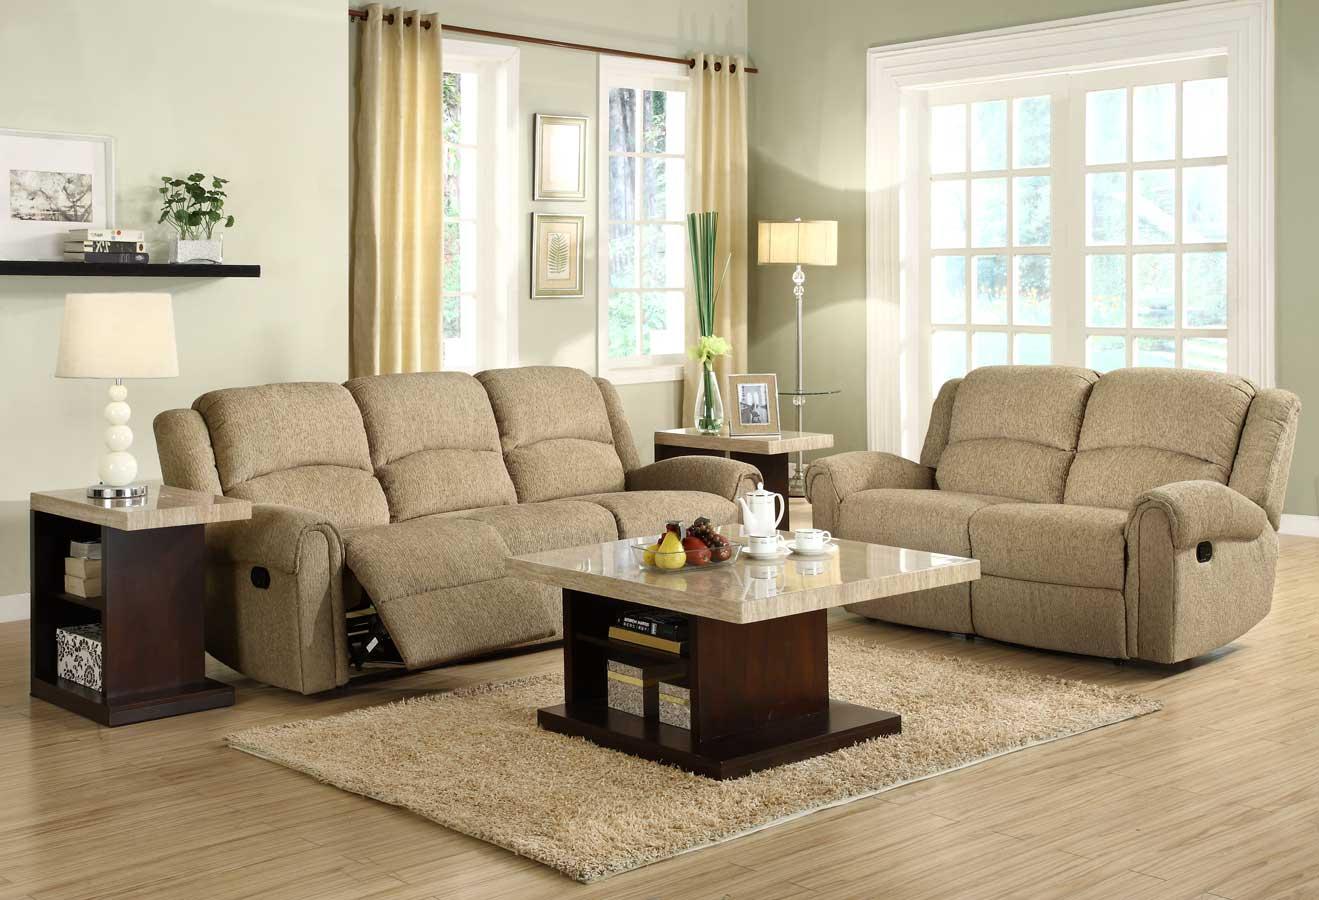 Homelegance Esther Reclining Sofa Set - Beige Chenille U9712BE-3 ...